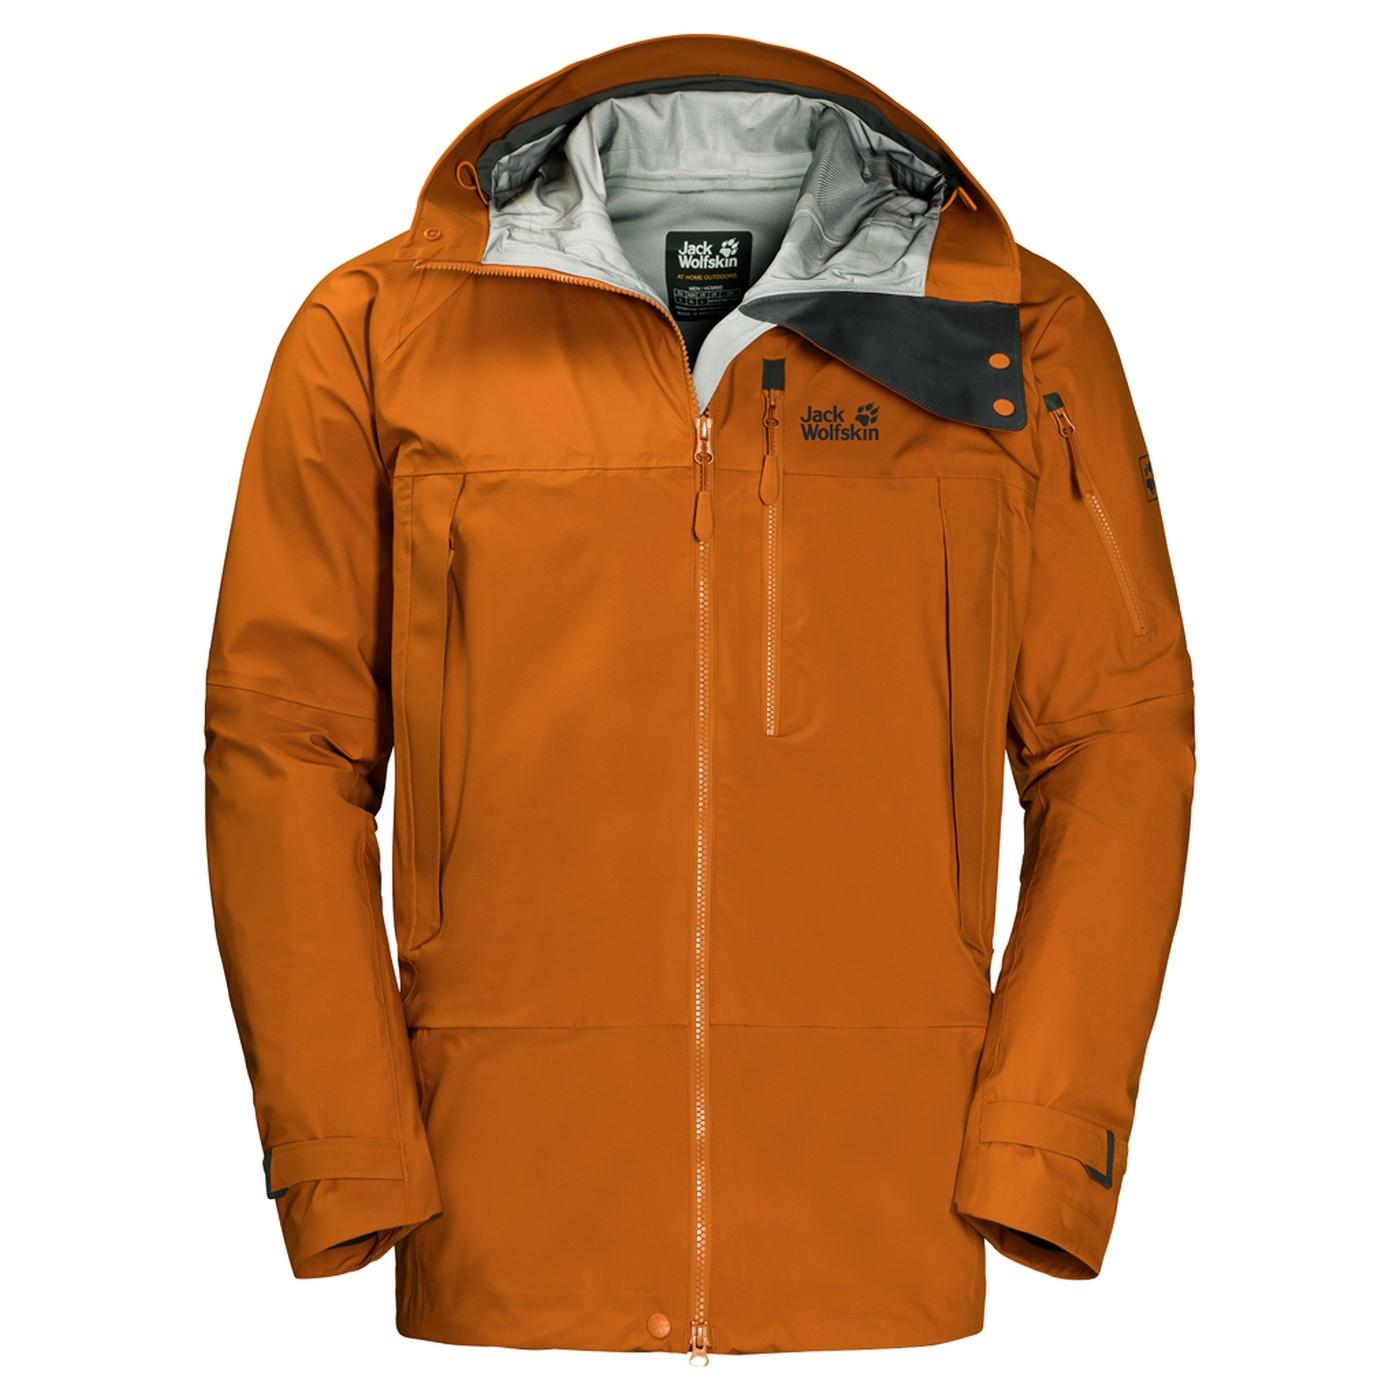 Jack Wolfskin Men's The Humboldt Jacket